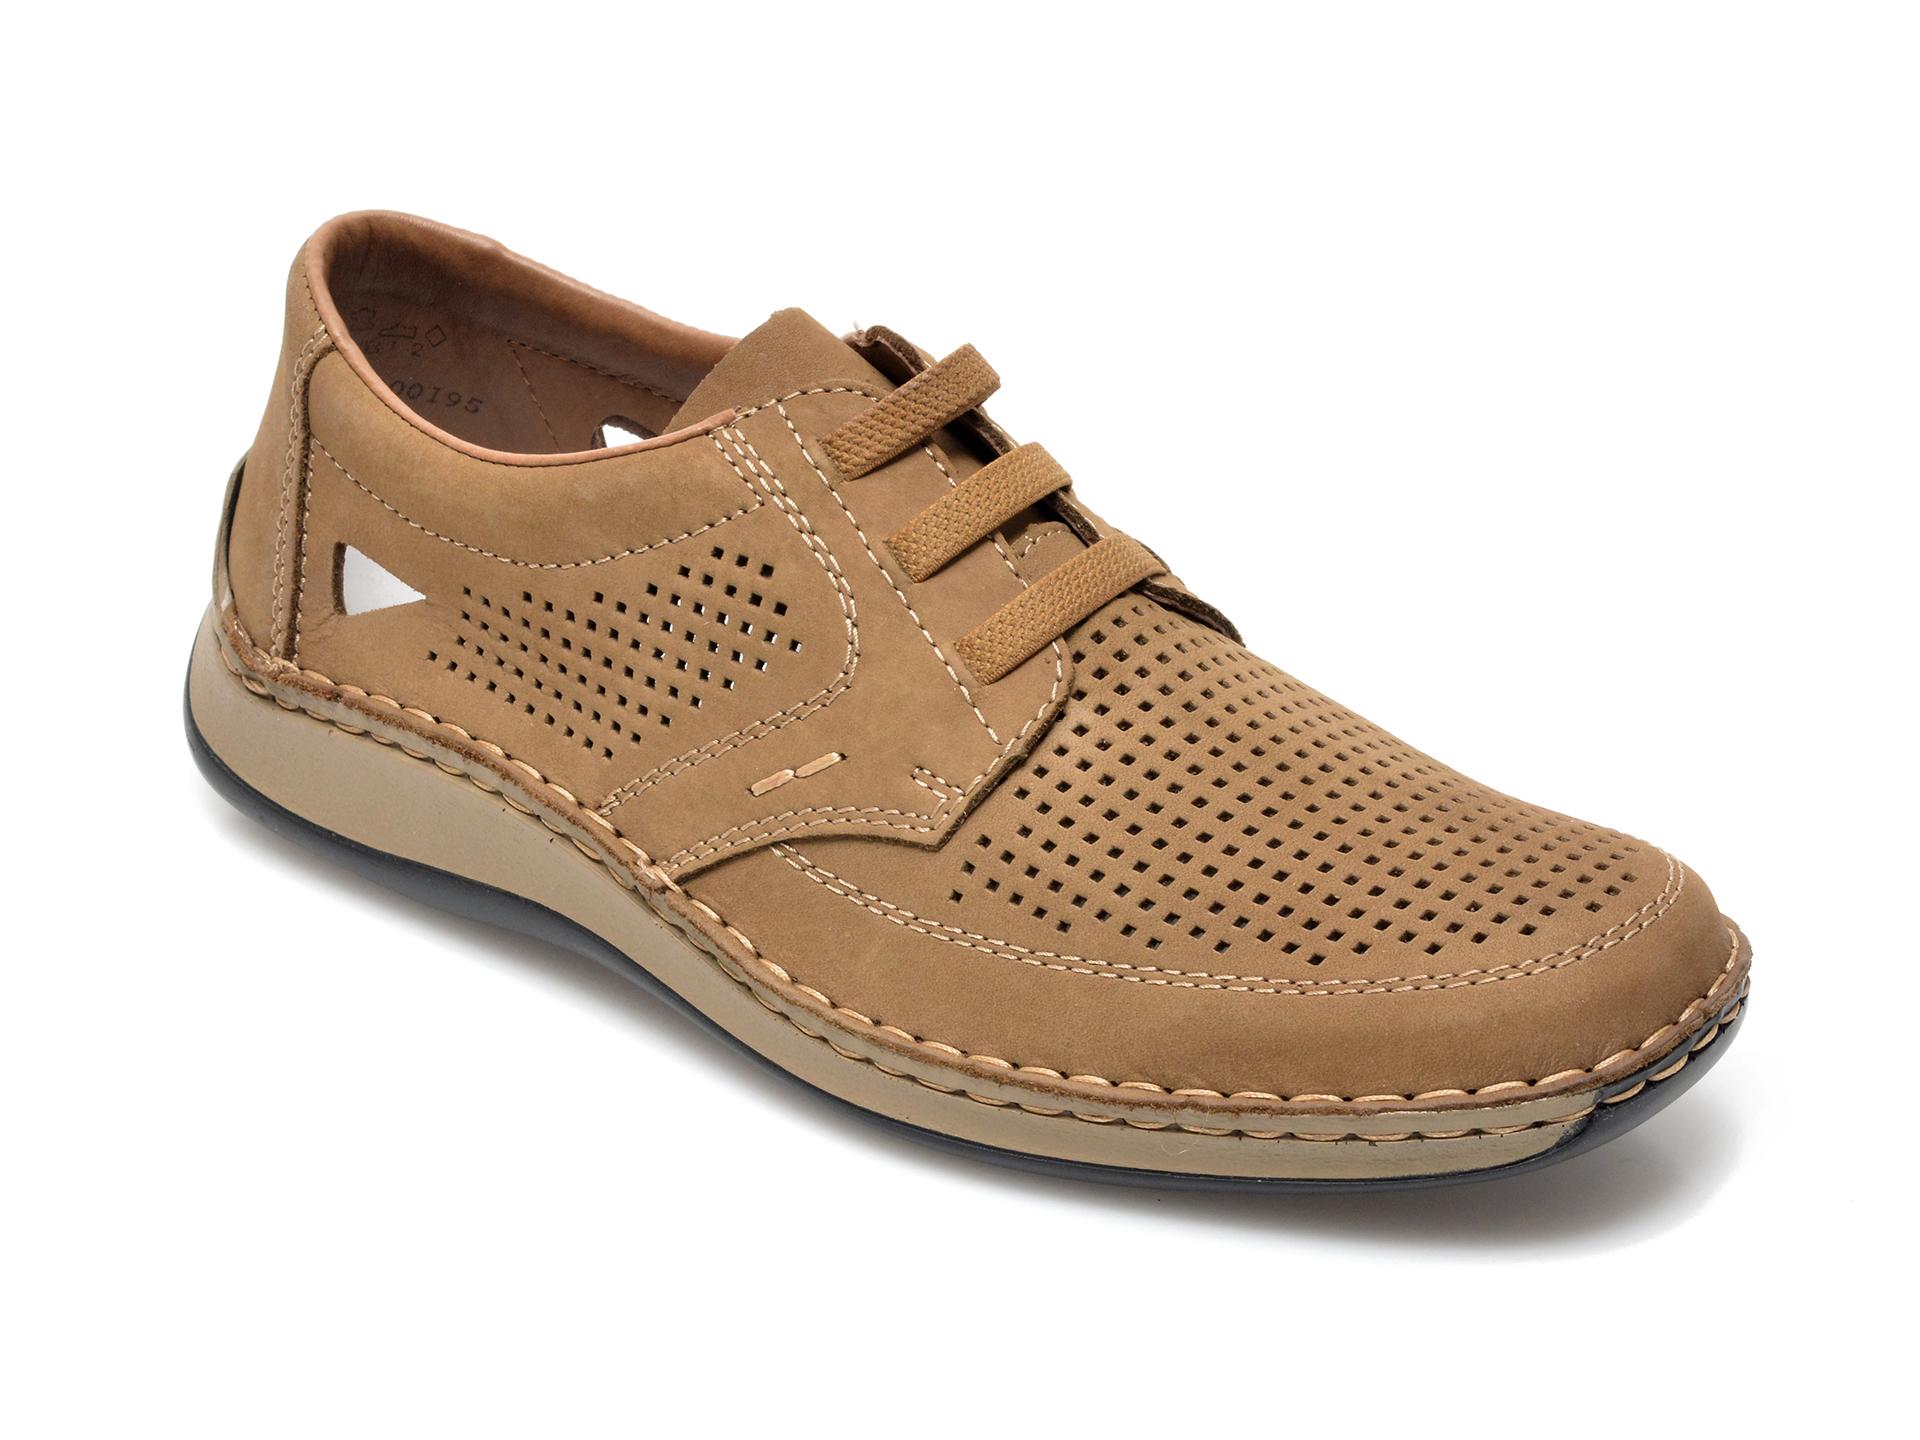 Pantofi RIEKER maro, 5259, din nabuc imagine otter.ro 2021